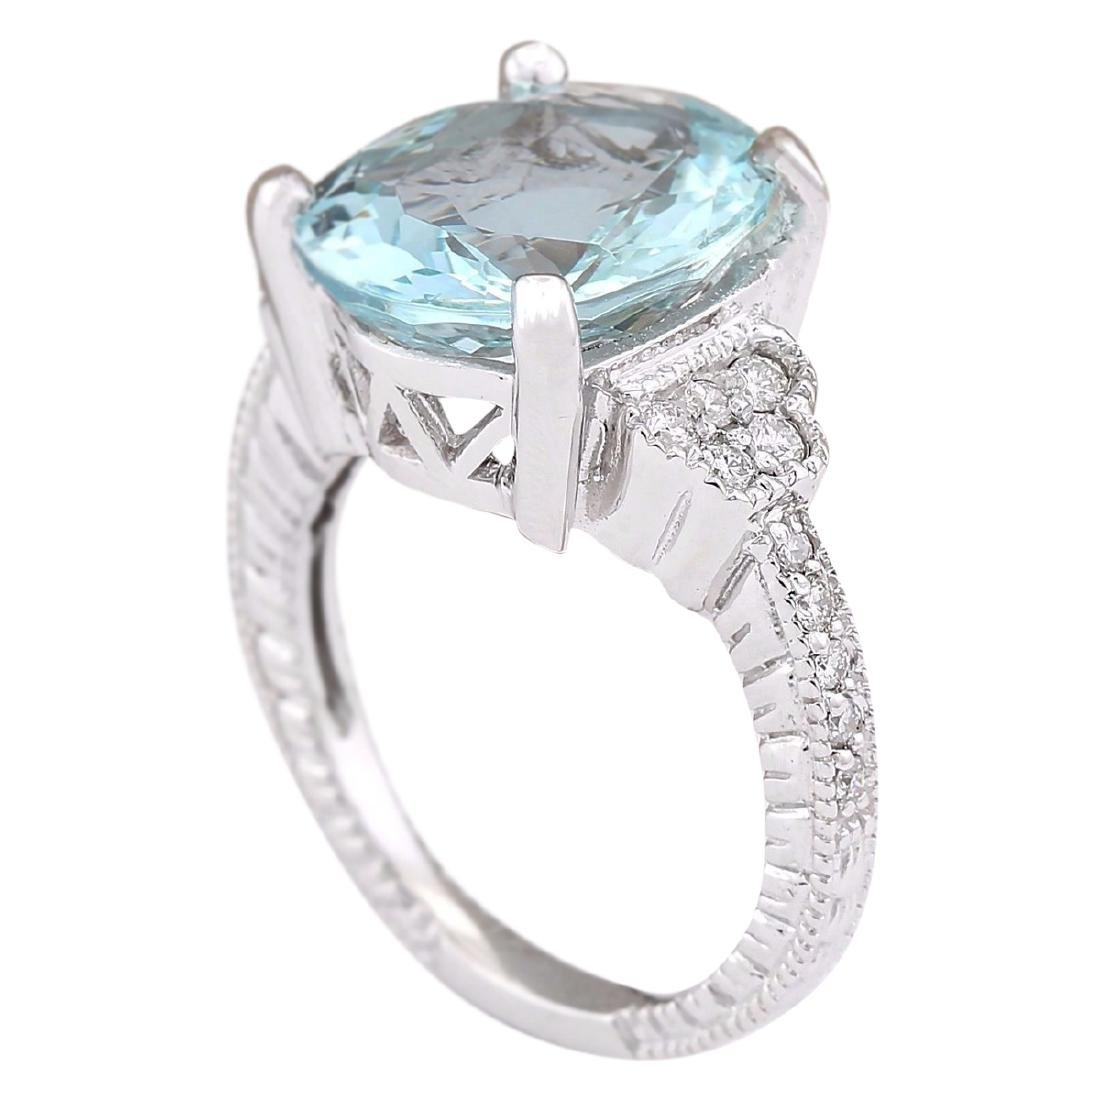 5.89 CTW Natural Aquamarine And Diamond Ring In 18K - 3